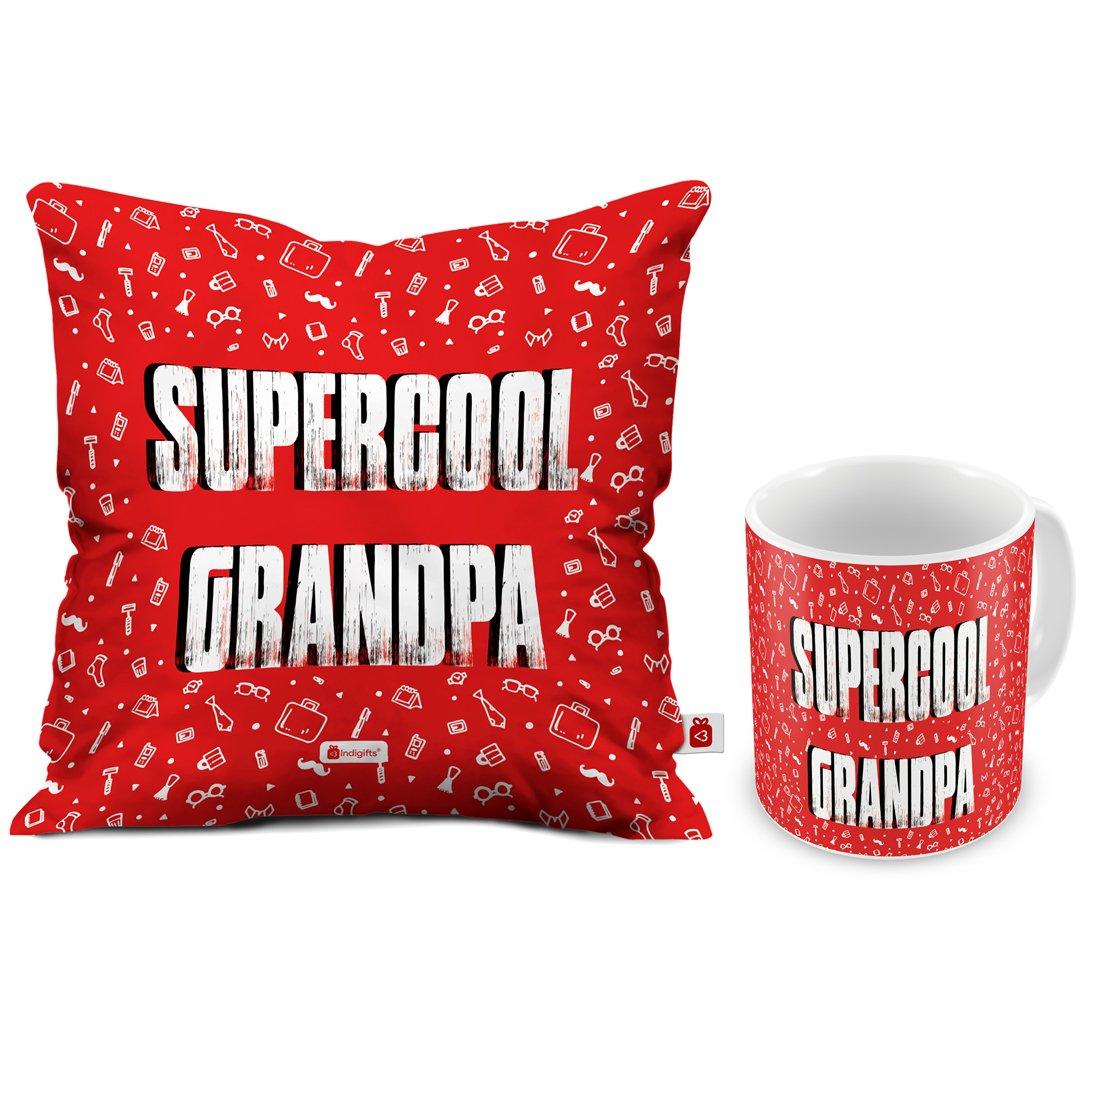 Buy Indi ts Grandfather Birthday Gifts Supercool Grandpa